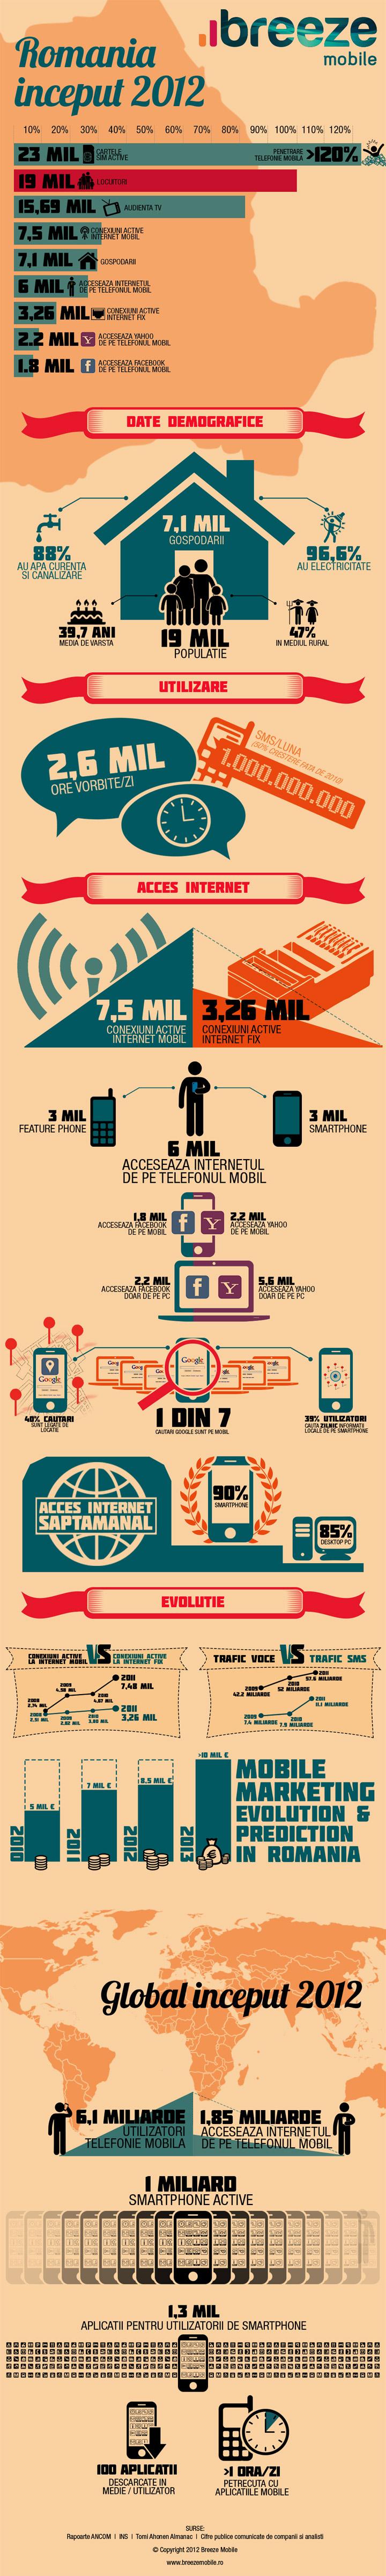 Lumea devine mai mobila-infografice